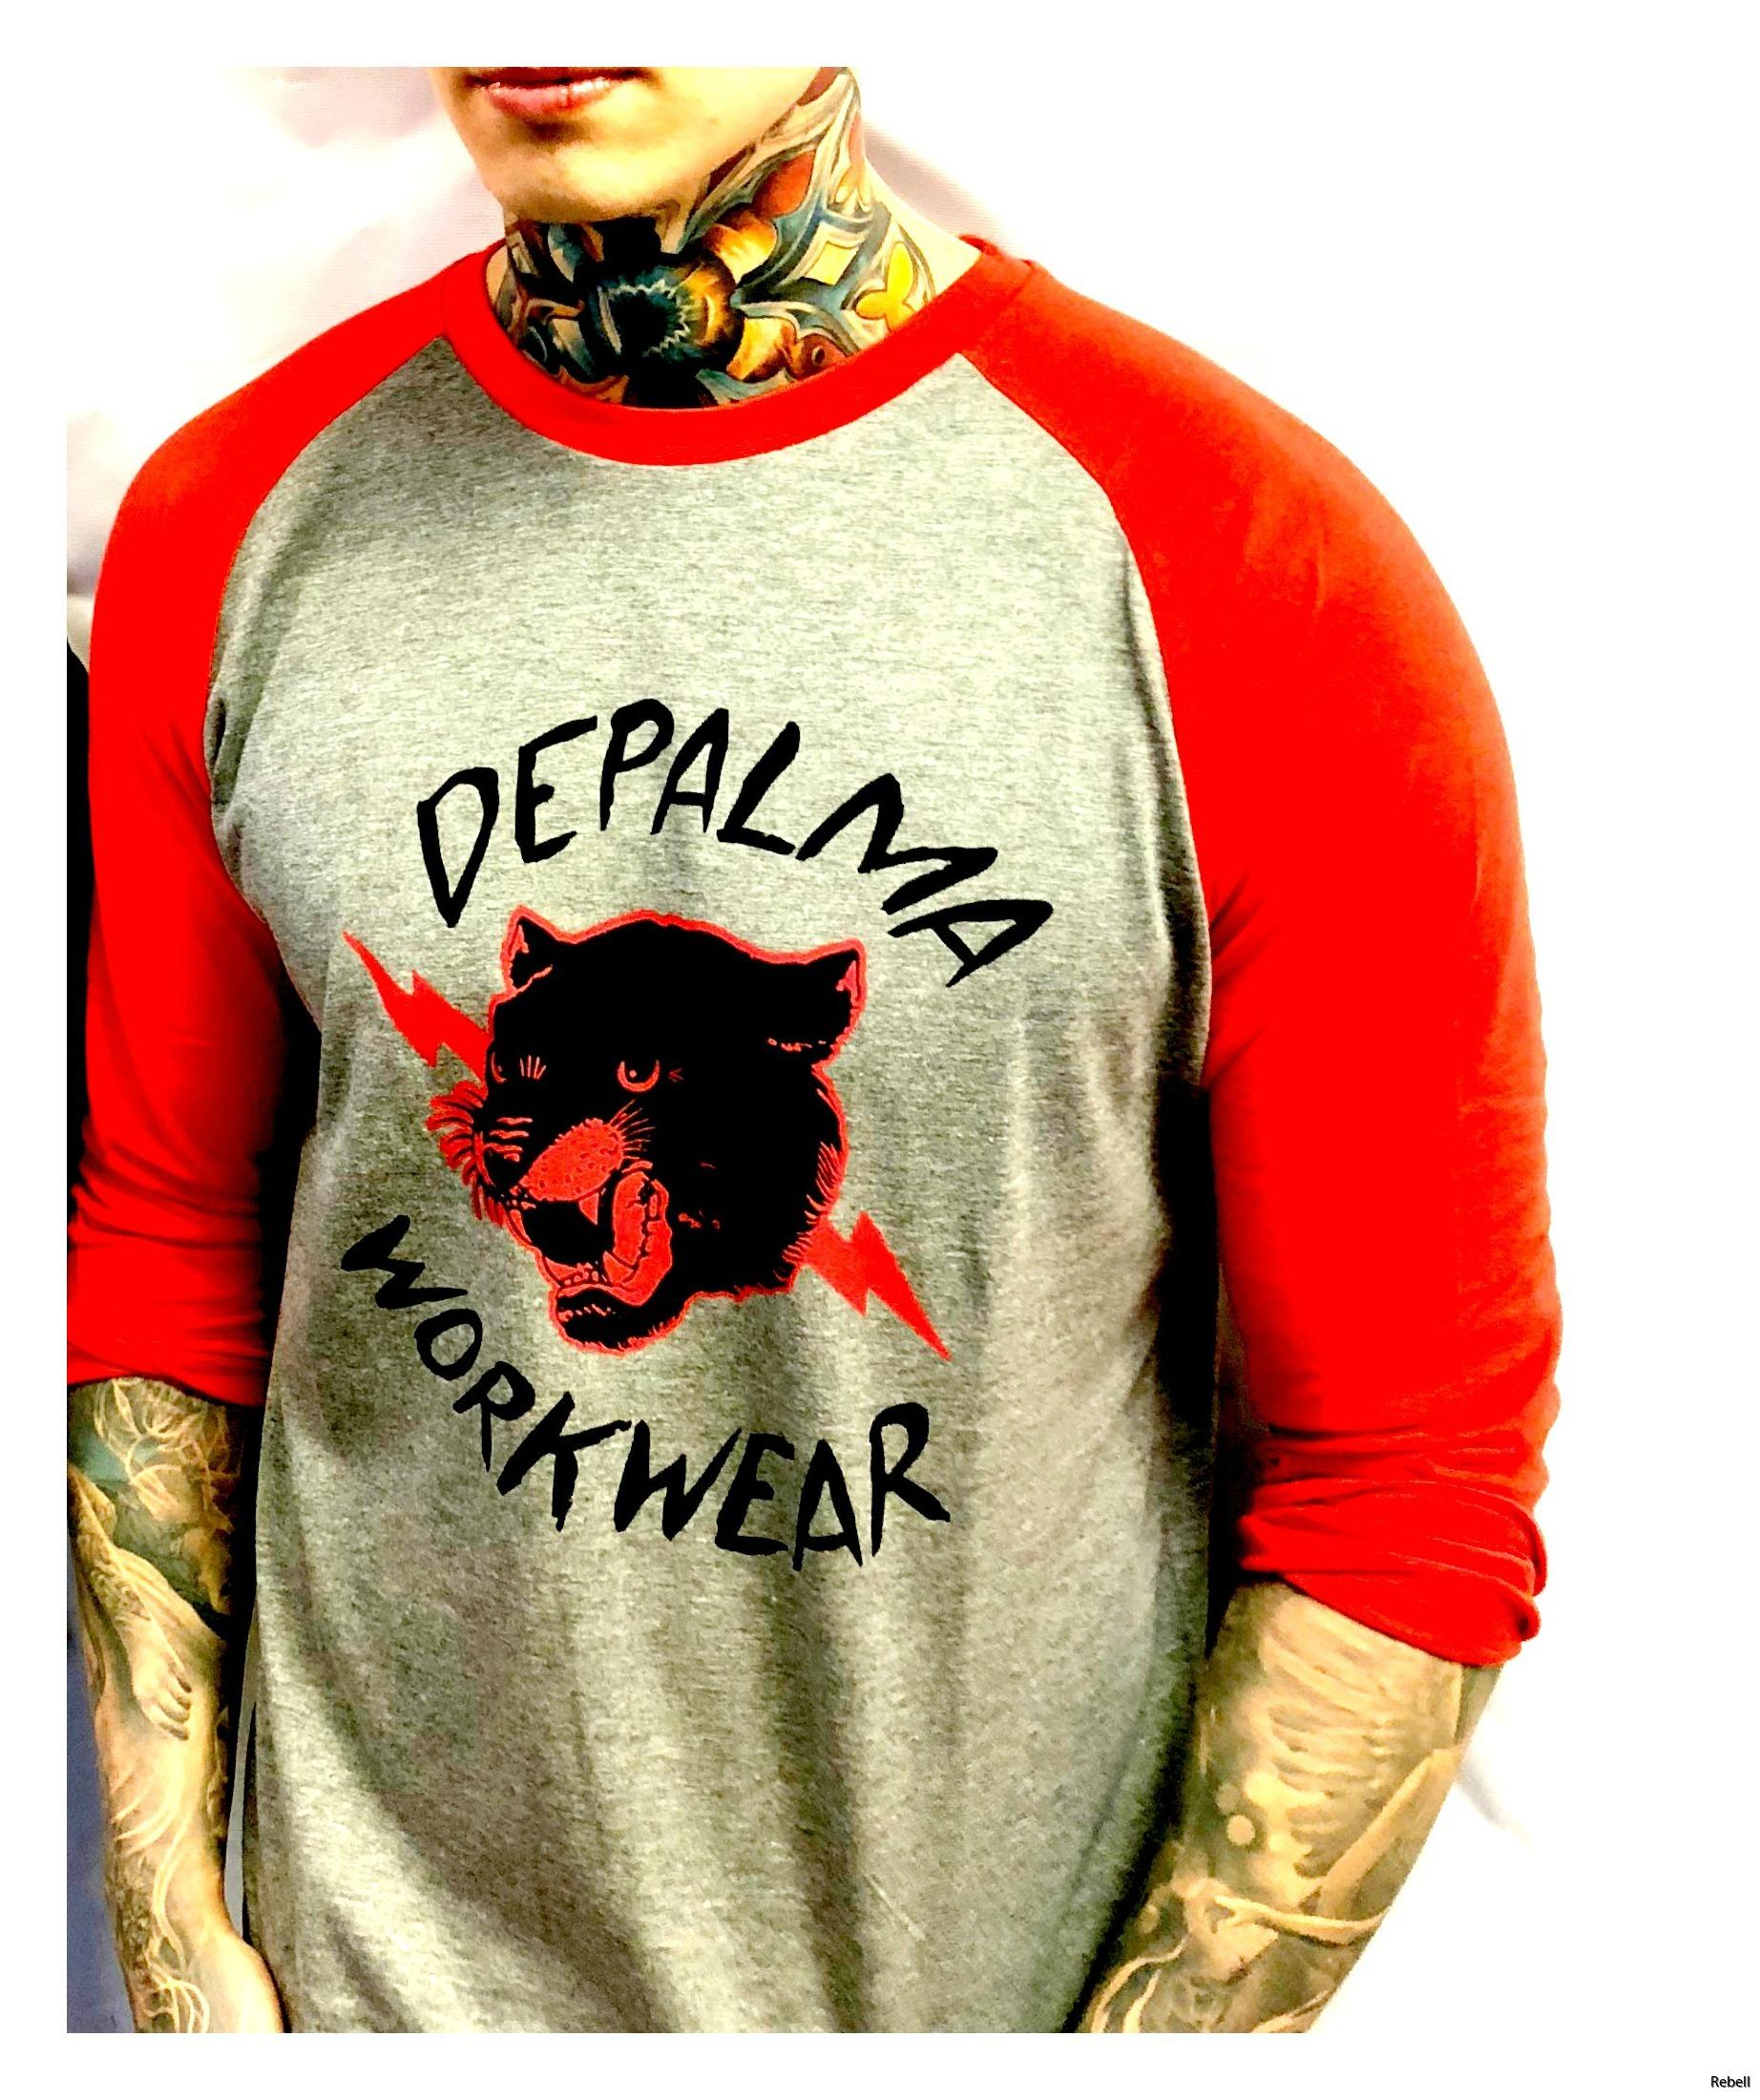 wildcat katt depalma blixt Skövde rebell rebellclothes rebellskövde rebellkläder workwear depalma